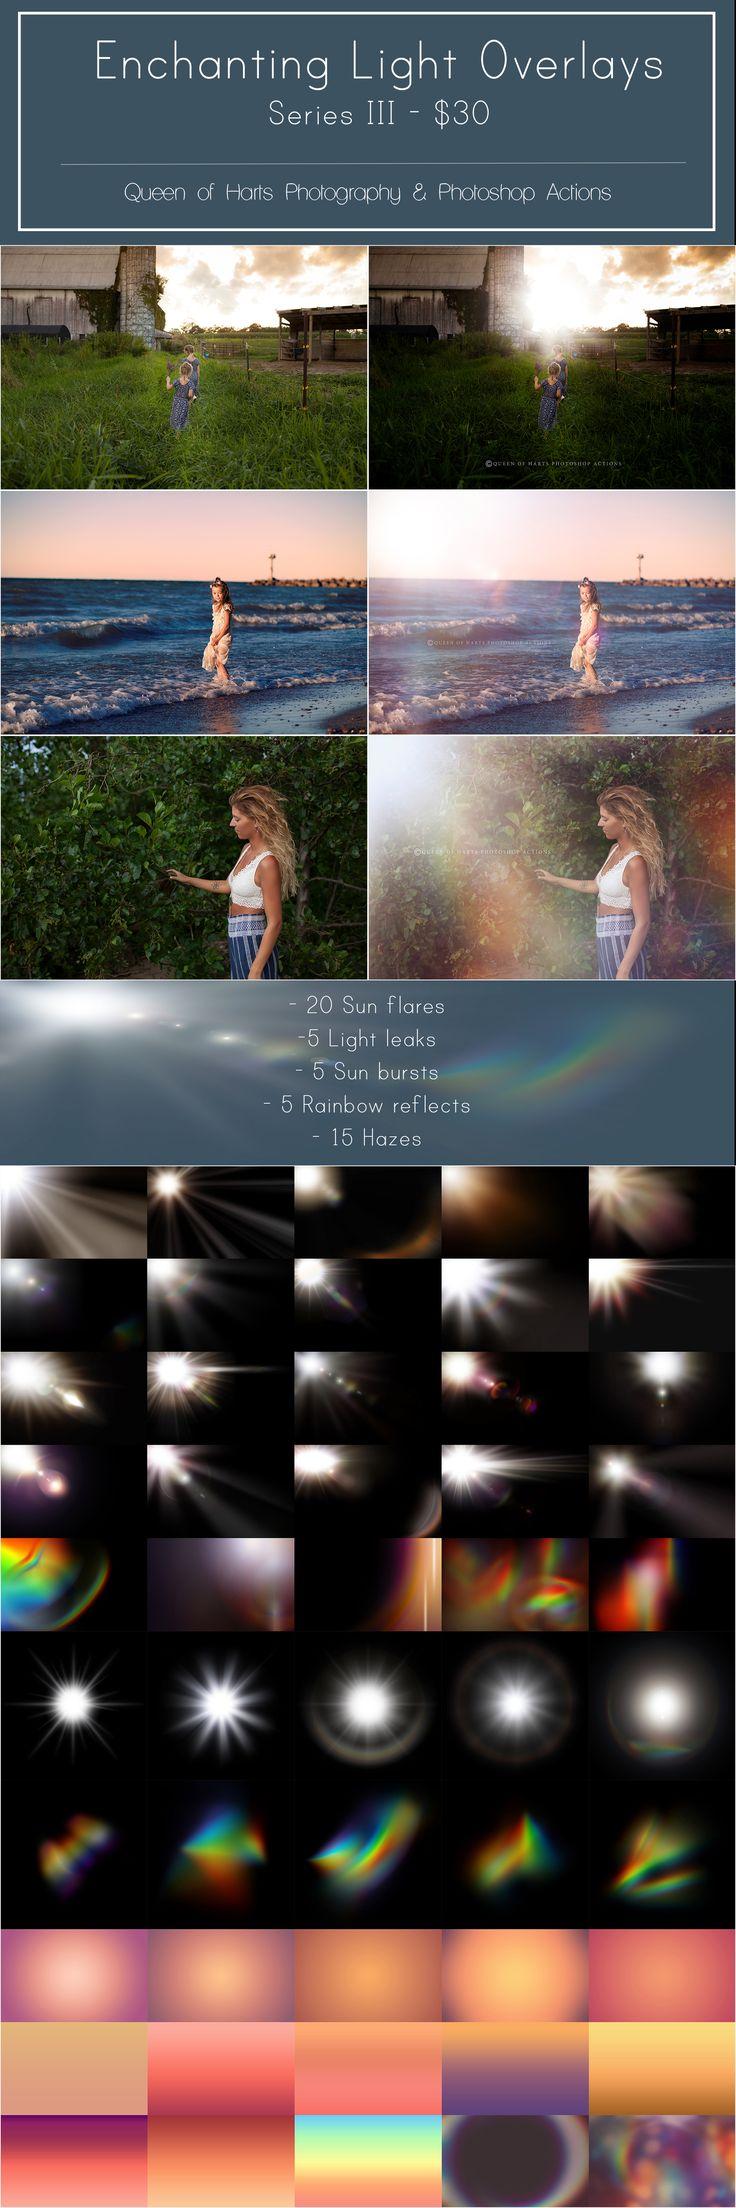 The best sun flare & light overlays for Photoshop. Only $30. #overlays #photoshop #sunflares #lightoverlays #lightleaks #rainbows #haze #hazeoverlays #bokeh